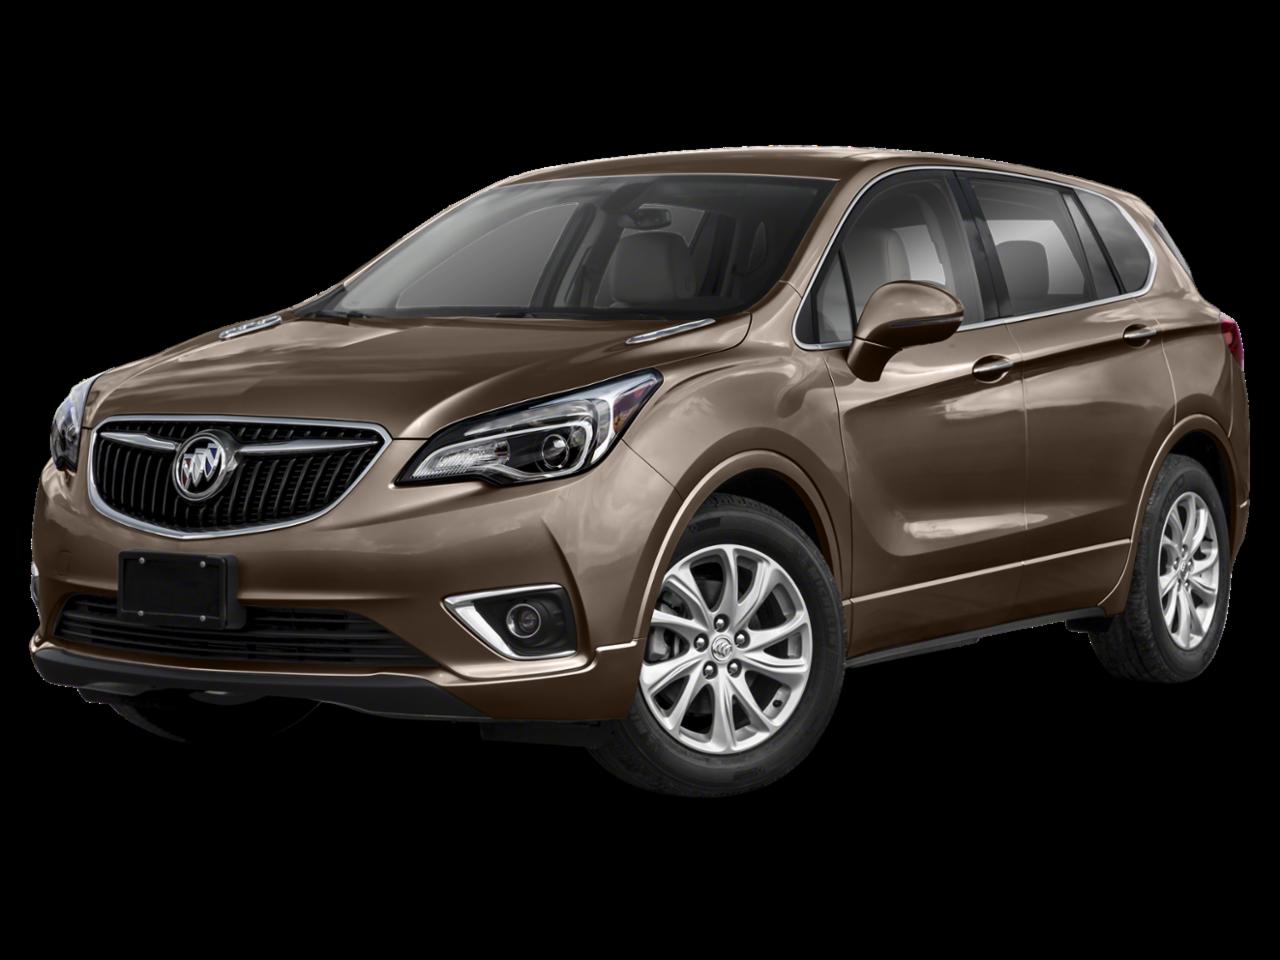 "2019 Buick<br/><span class=""vdp-trim"">Envision Essence AWD 4D Sport Utility</span>"